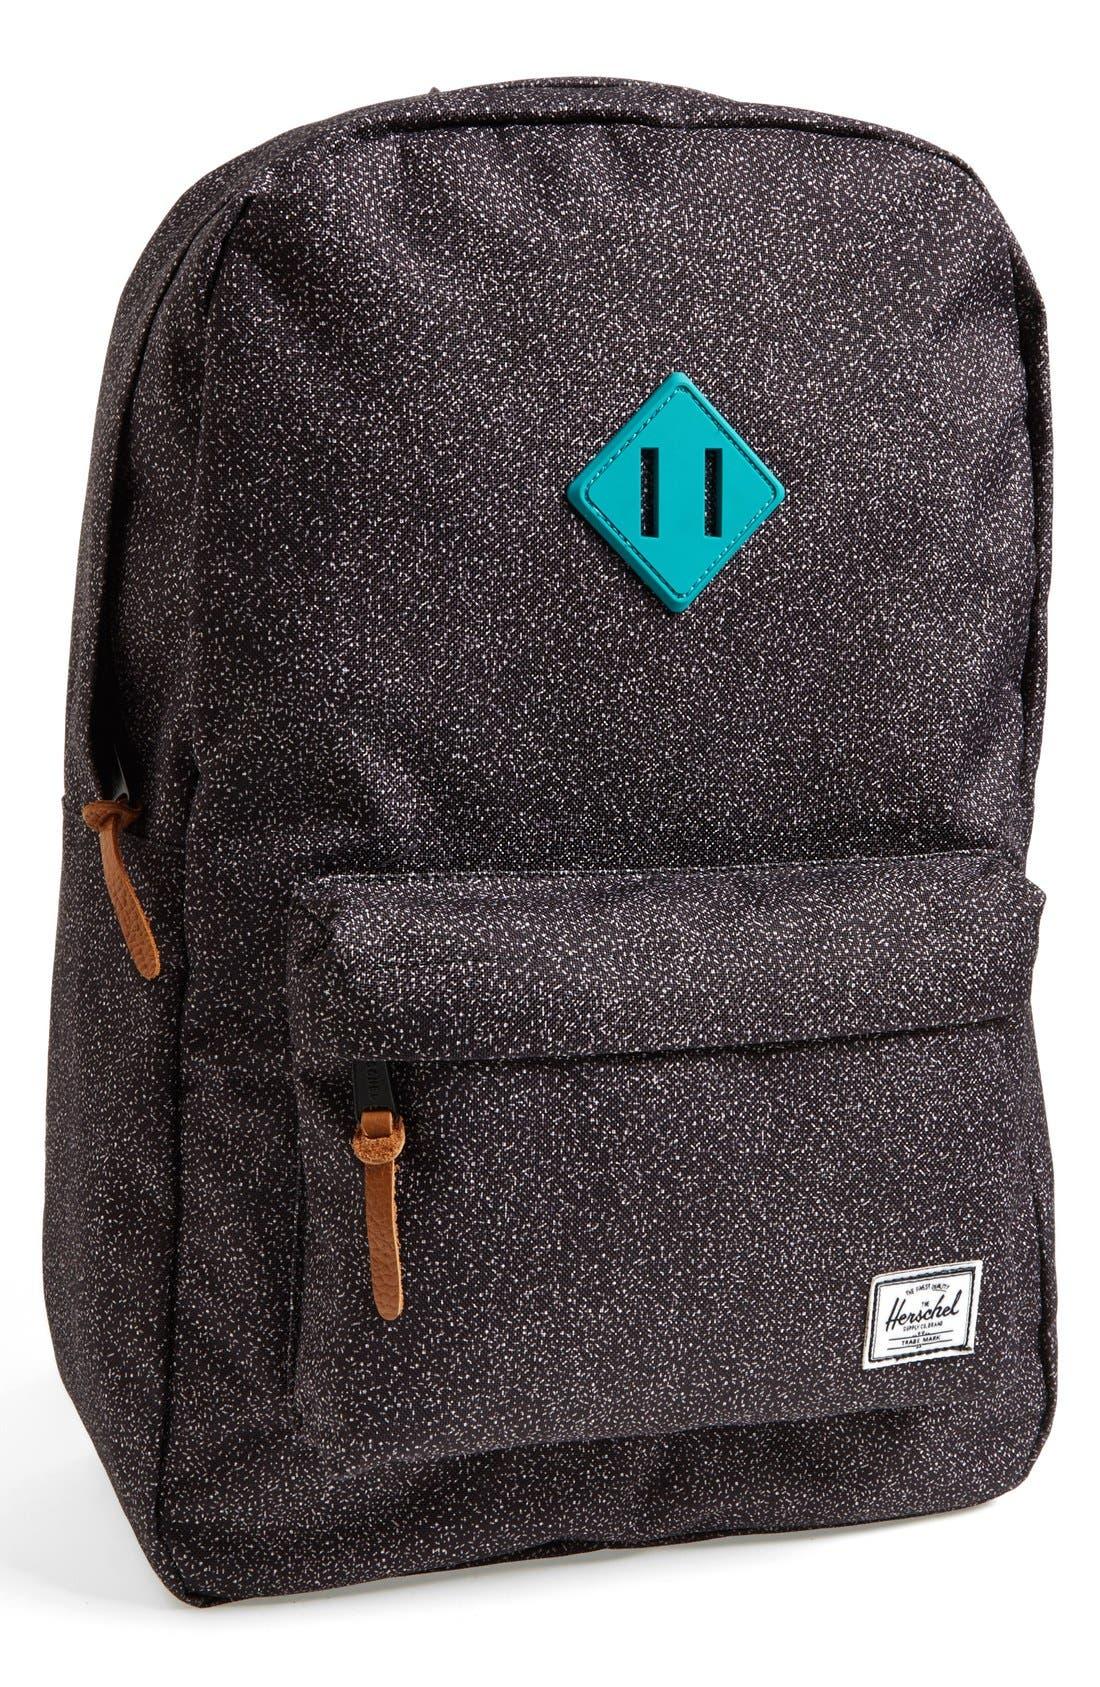 Alternate Image 1 Selected - Herschel Supply Co. 'Heritage' Backpack